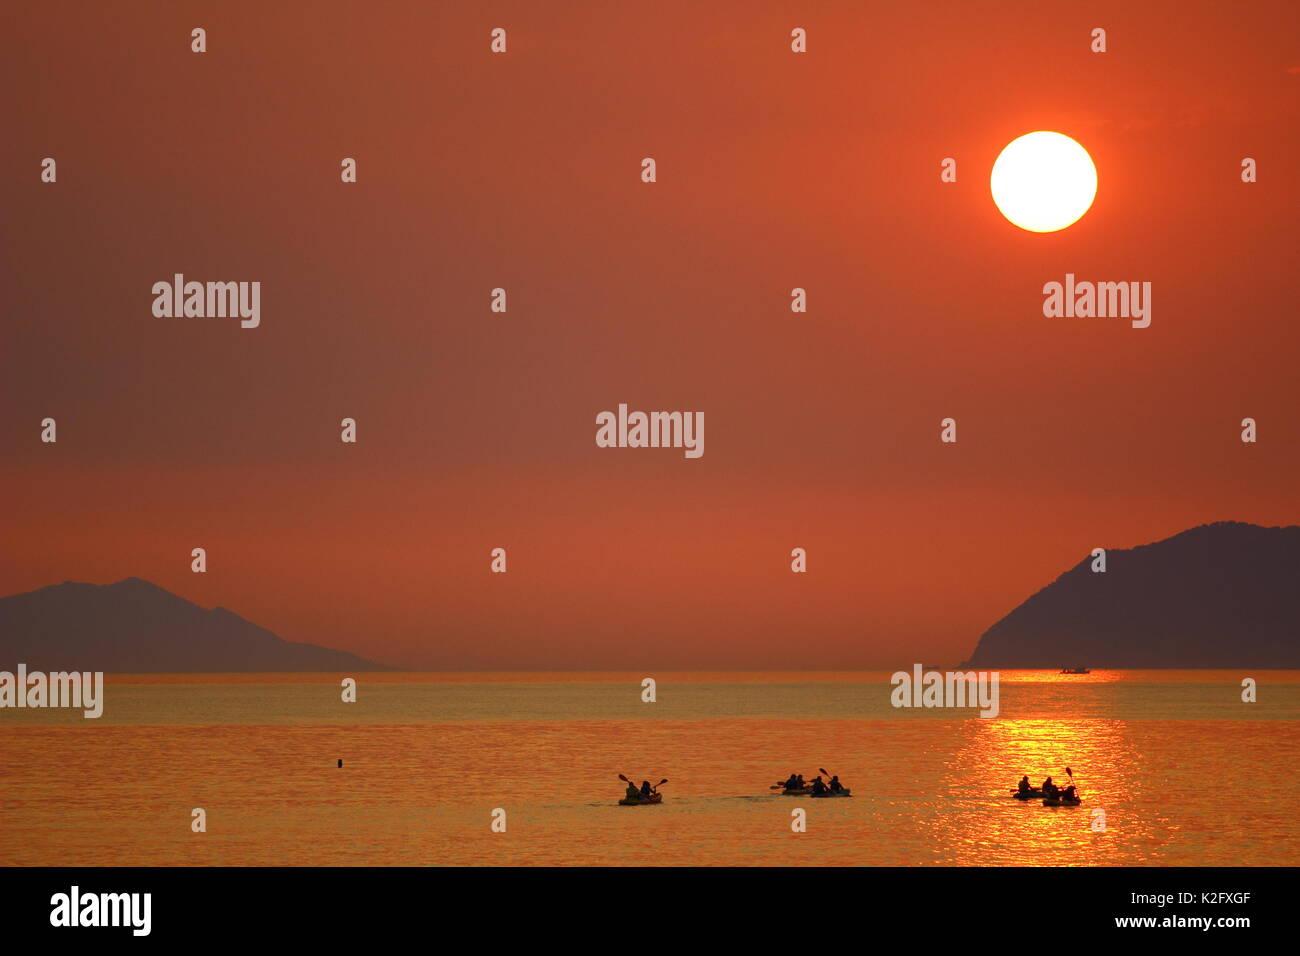 Sea kayaking at sunset, warm summer day, Croatia - Stock Image